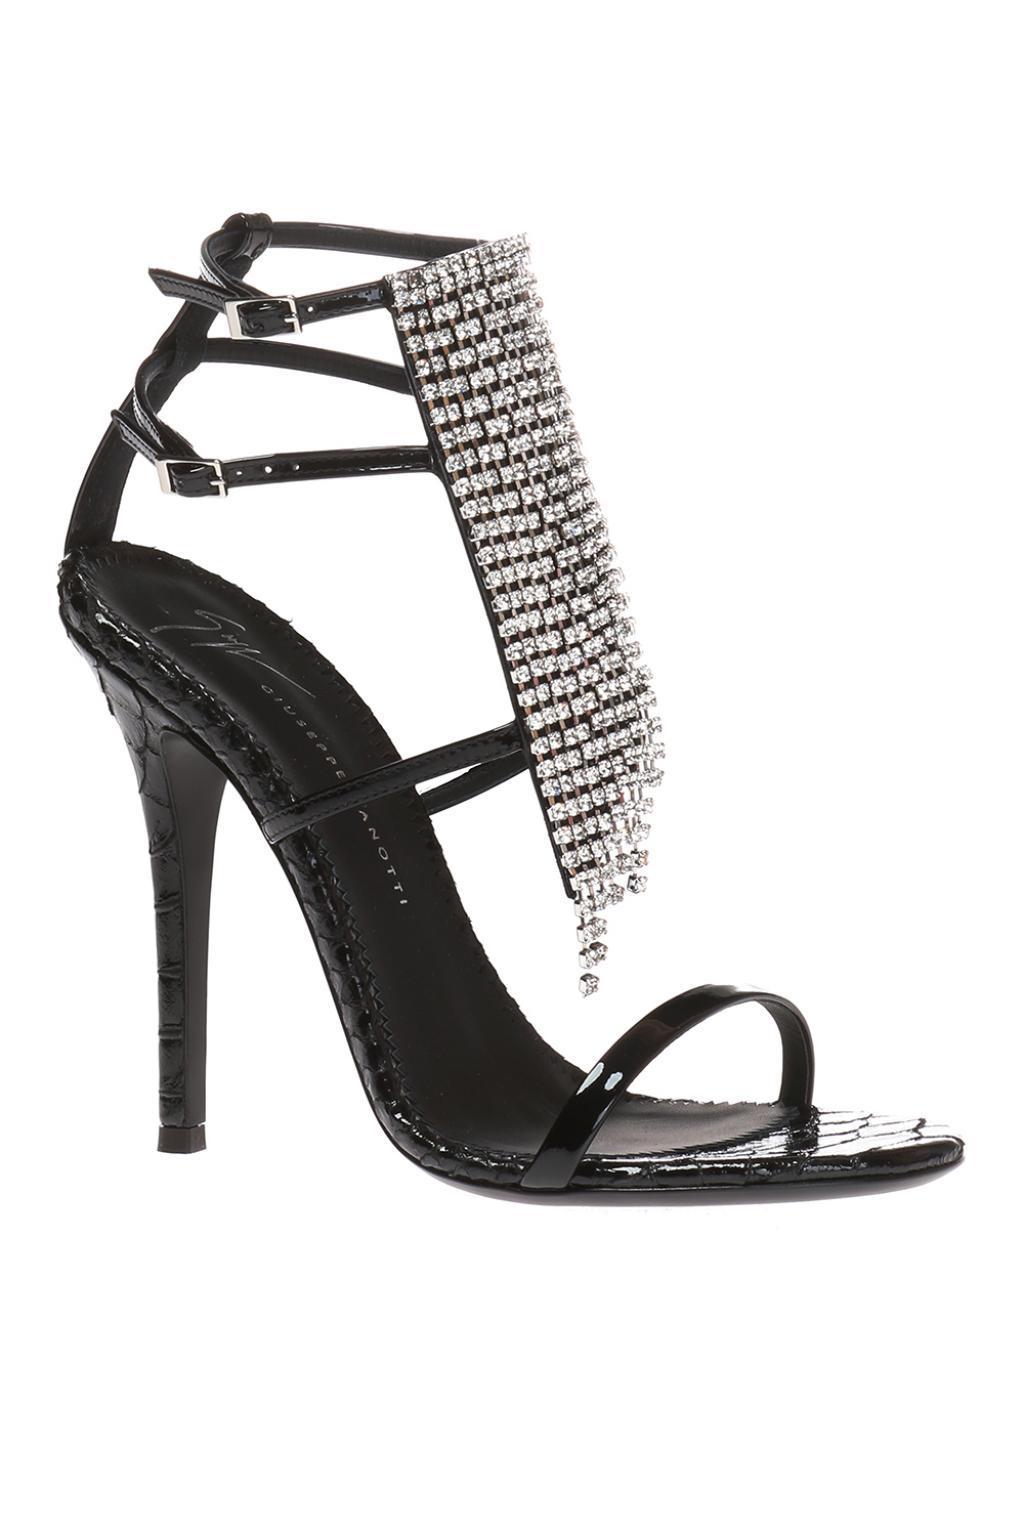 af5da3ed42a Giuseppe Zanotti - Black  alien  Heeled Sandals - Lyst. View fullscreen